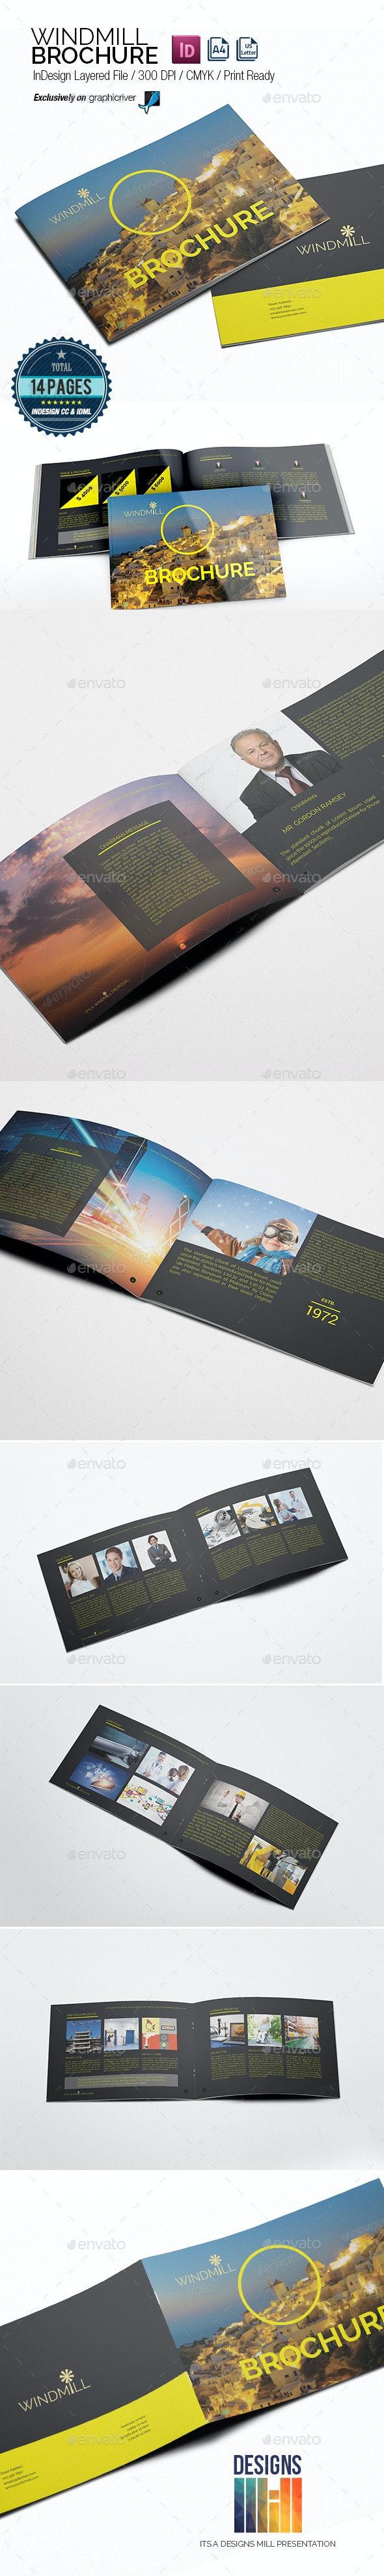 Windmill Multipurpose Brochure - Informational Brochures